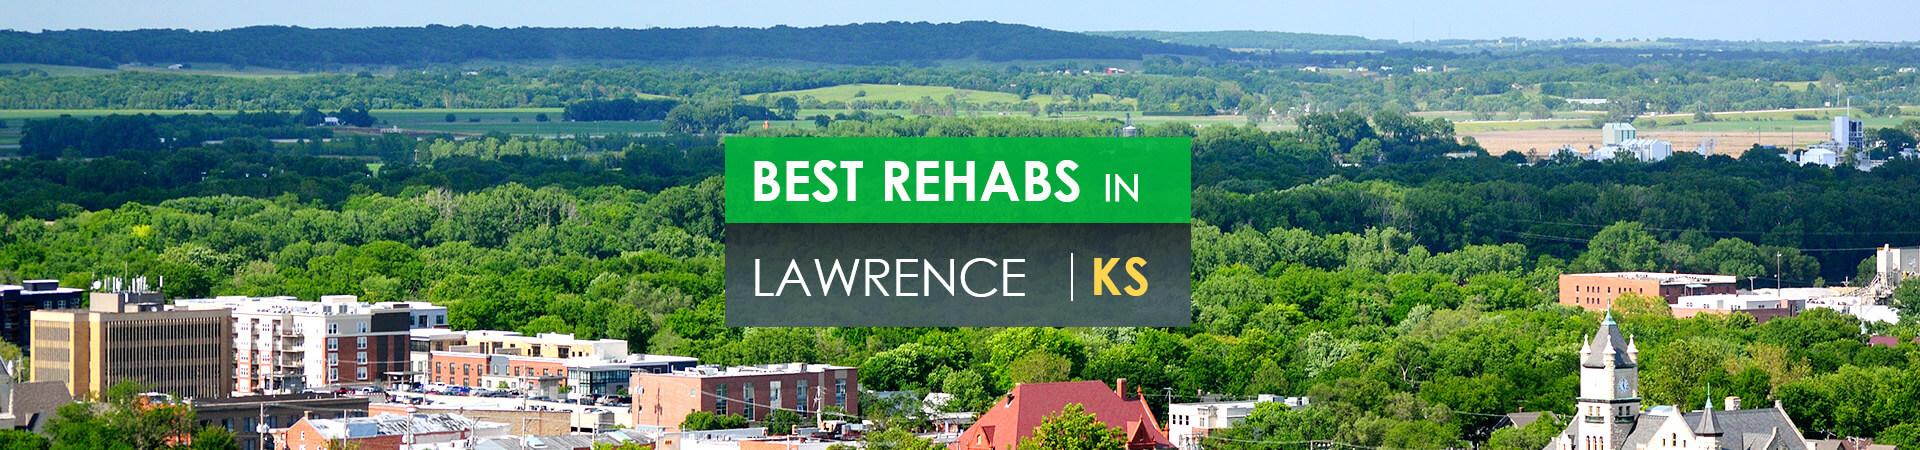 Best rehabs in Lawrence, KS